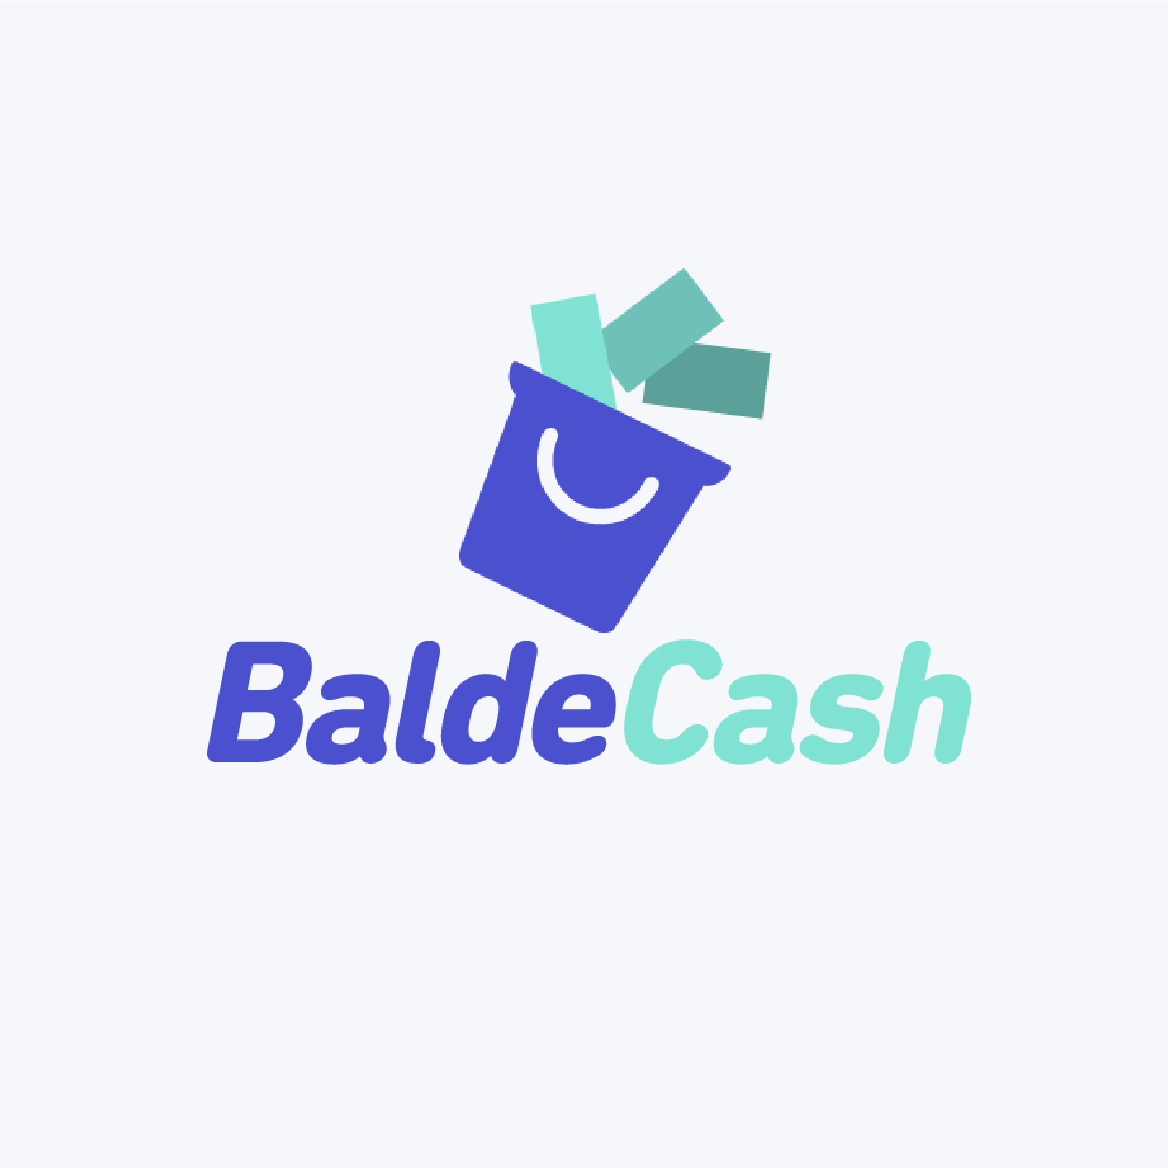 Baldecash